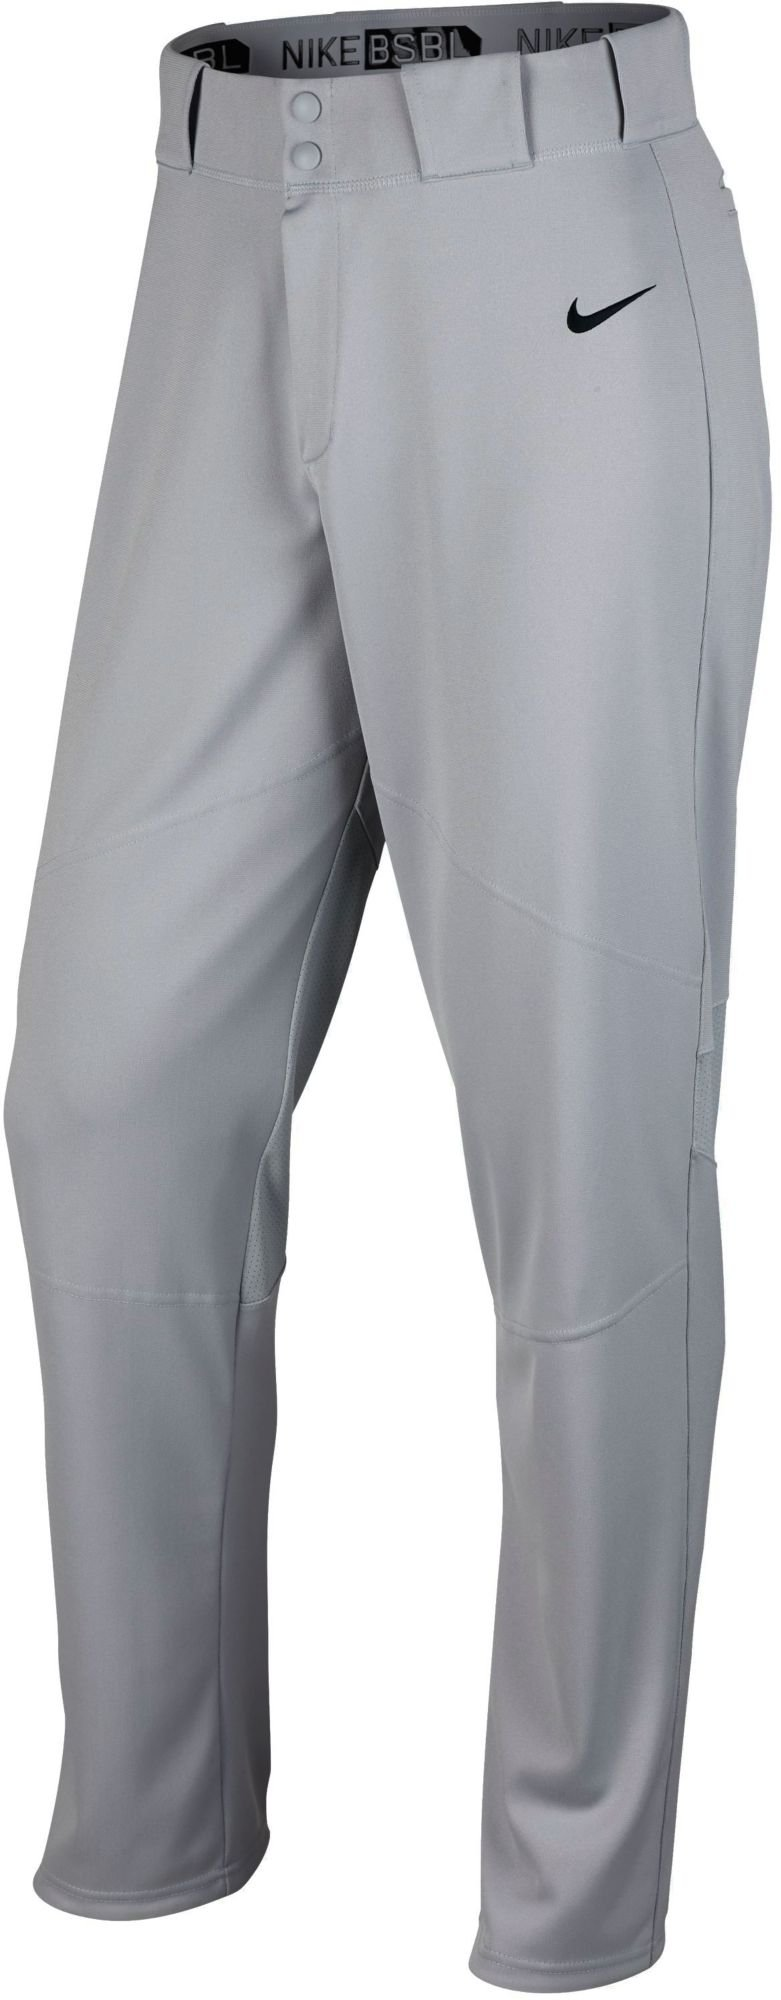 Nike Boys' Pro Vapor Baseball Pants (X-Small, Gray) by Nike